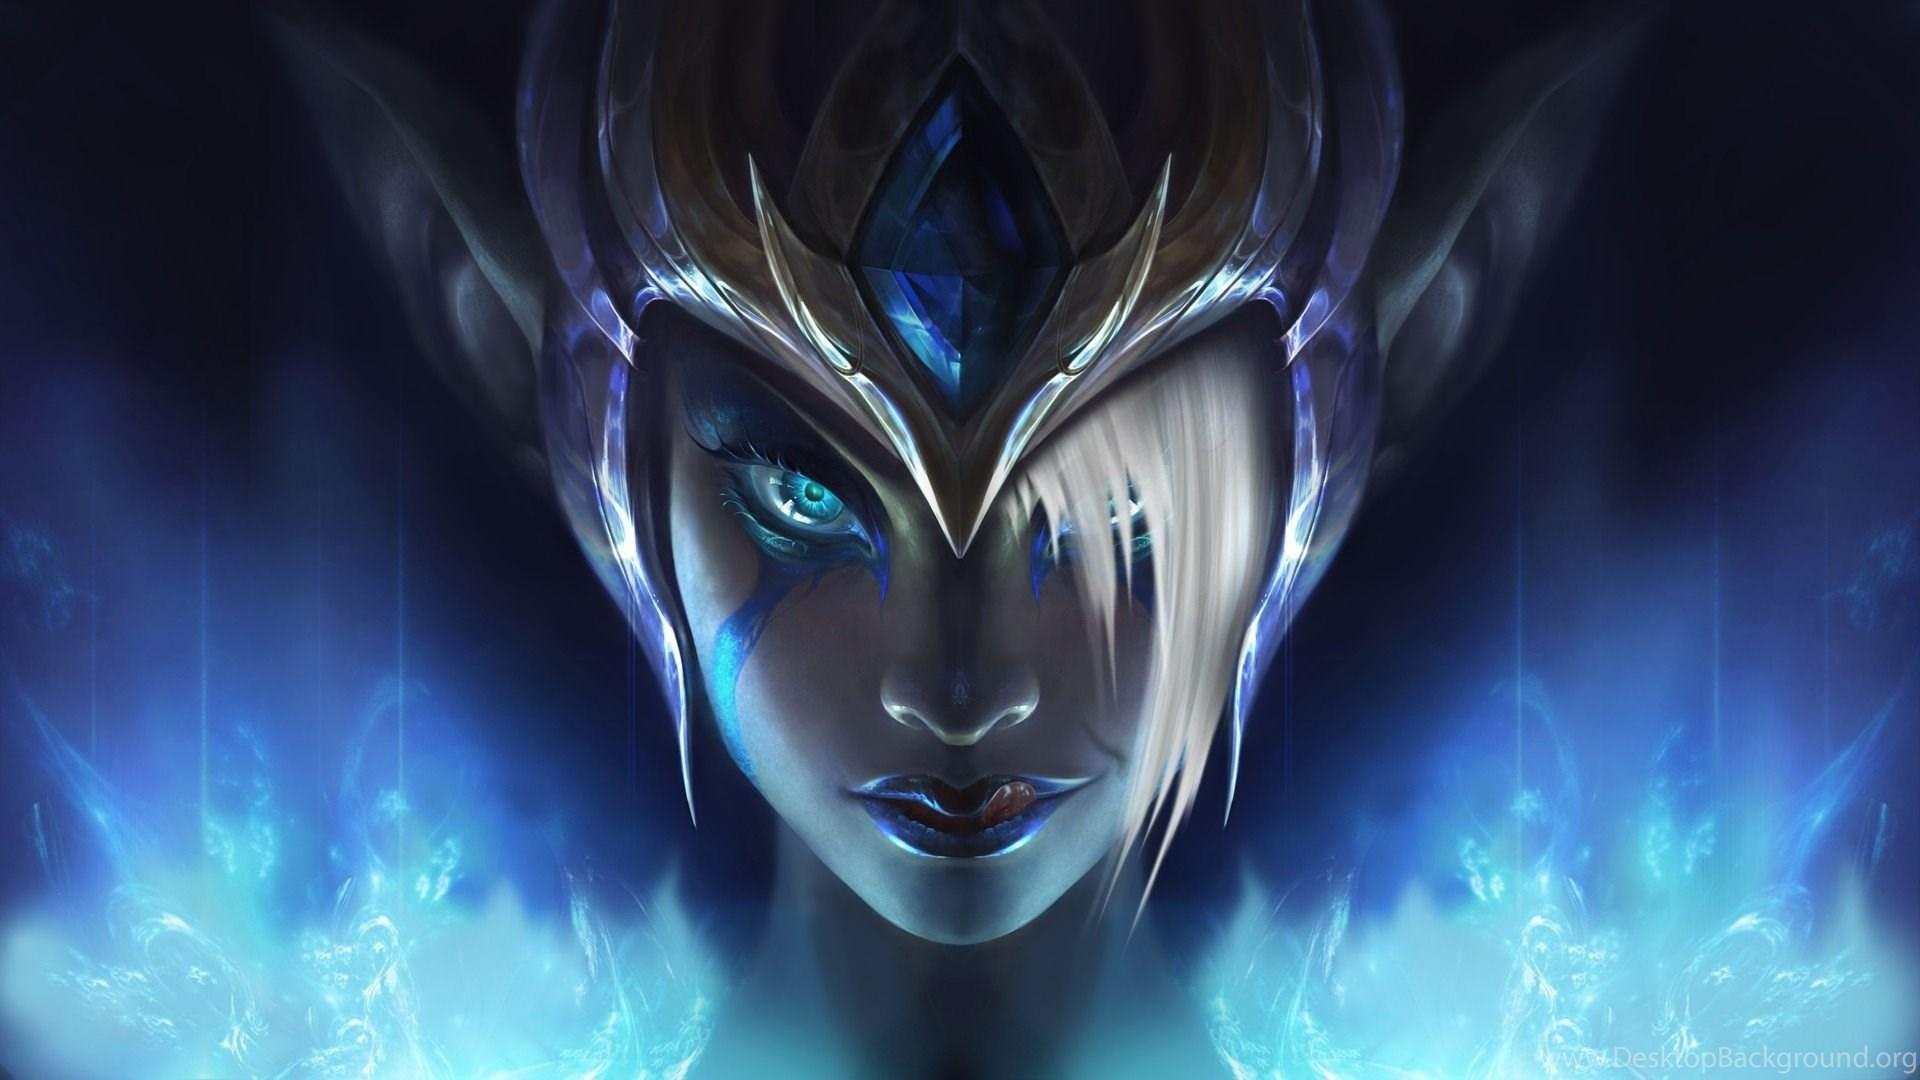 Jhin League Of Legends Wallpapers Hd Download For Computer Desktop